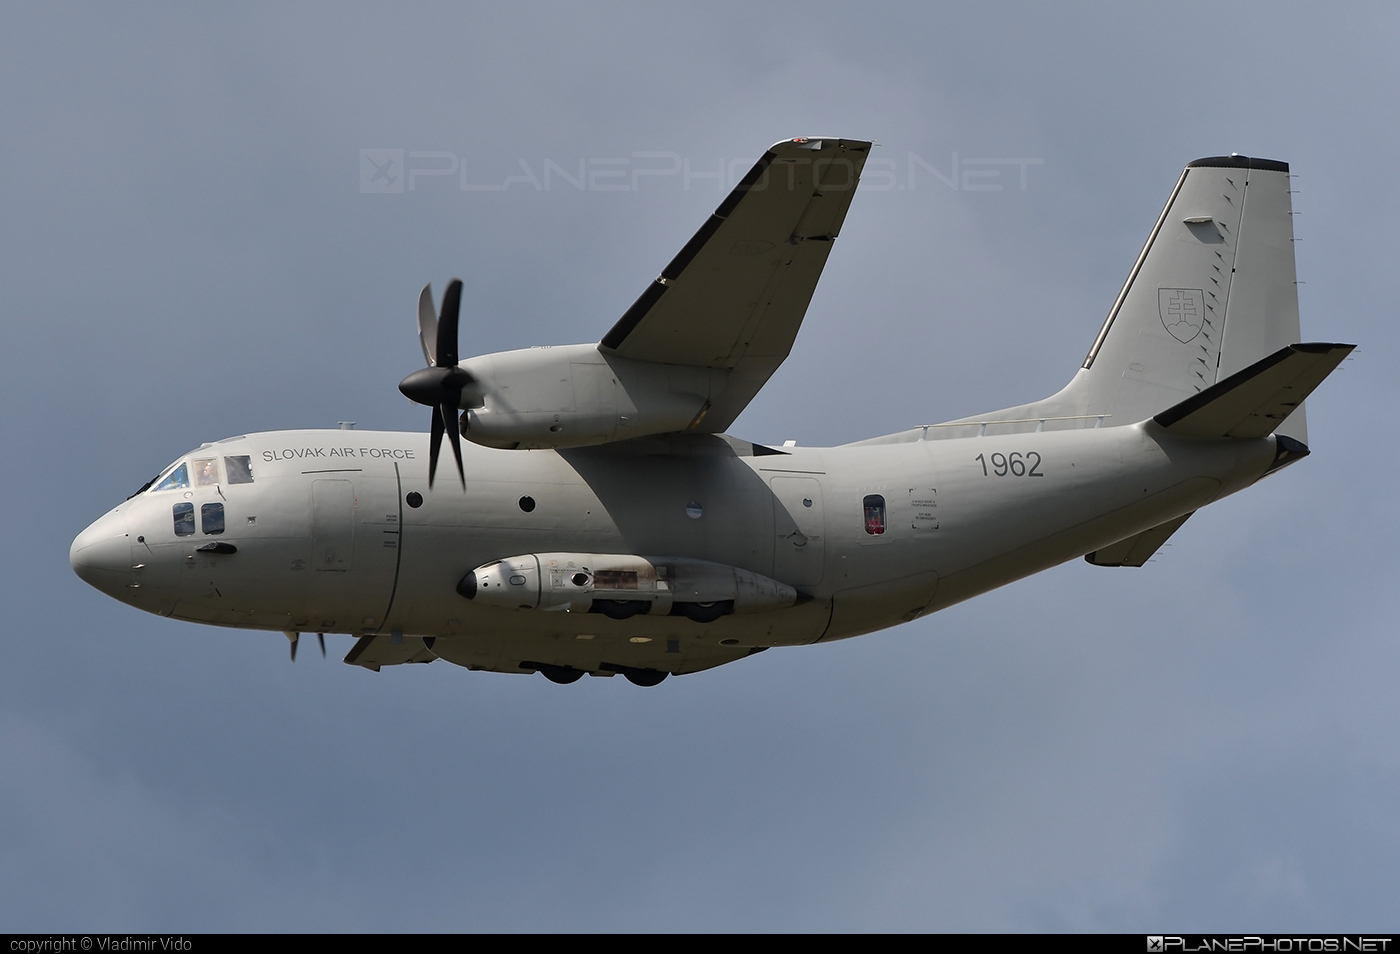 Leonardo C-27J Spartan - 1962 operated by Vzdušné sily OS SR (Slovak Air Force) #c27j #c27jspartan #c27spartan #leonardo #leonardo27j #leonardoc27jspartan #leonardospartan #siaf2019 #slovakairforce #vzdusnesilyossr